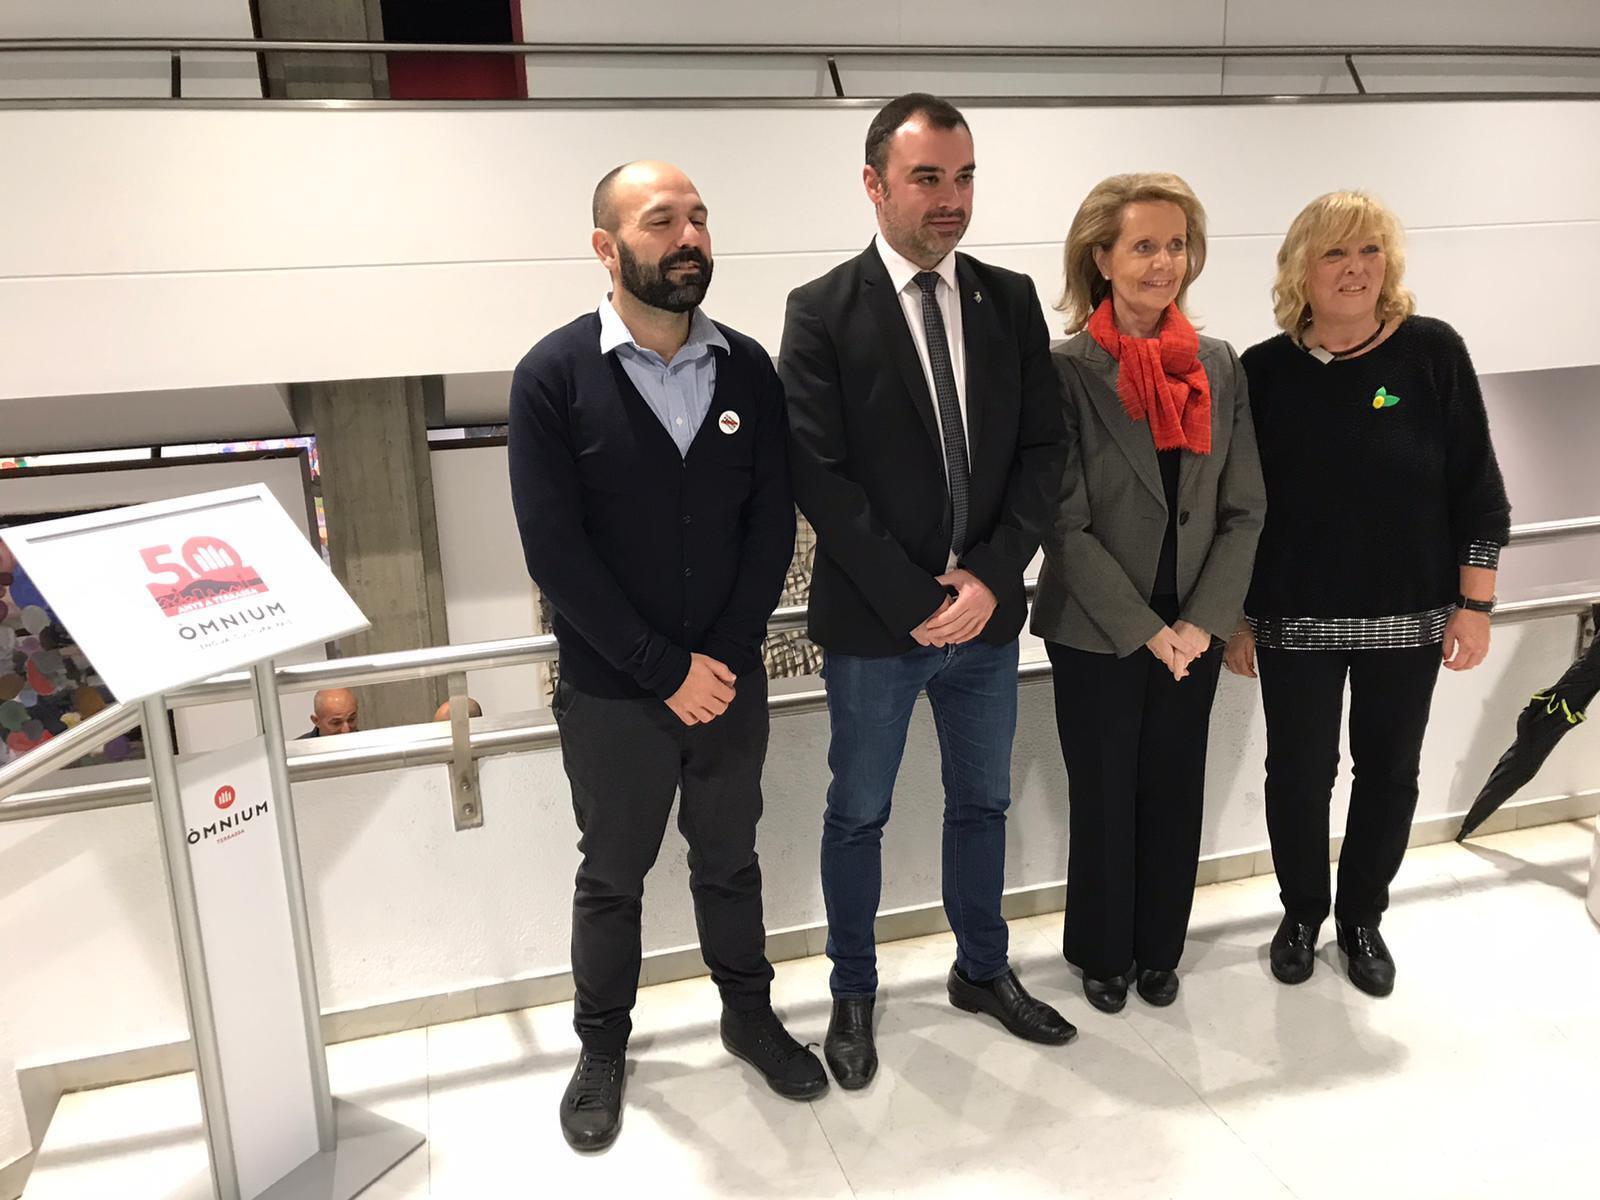 Marcel Mauri, Jordi Ballart, Mariàngela Vilallonga i Anna Carol